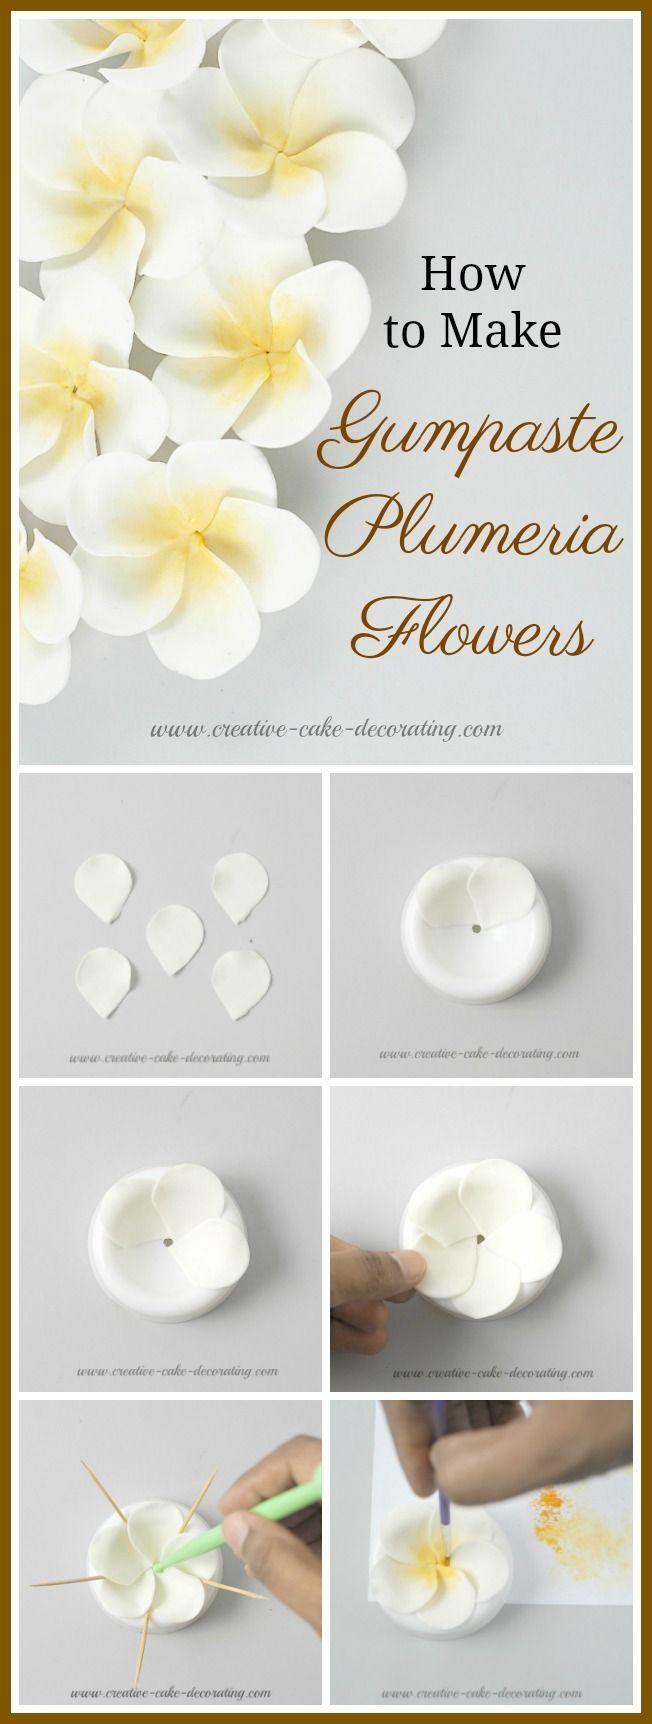 401 best fondant flowers images on pinterest fondant flowers gum here is a plumeria wedding cake i designed with gumpaste plumeria flowers also known as izmirmasajfo